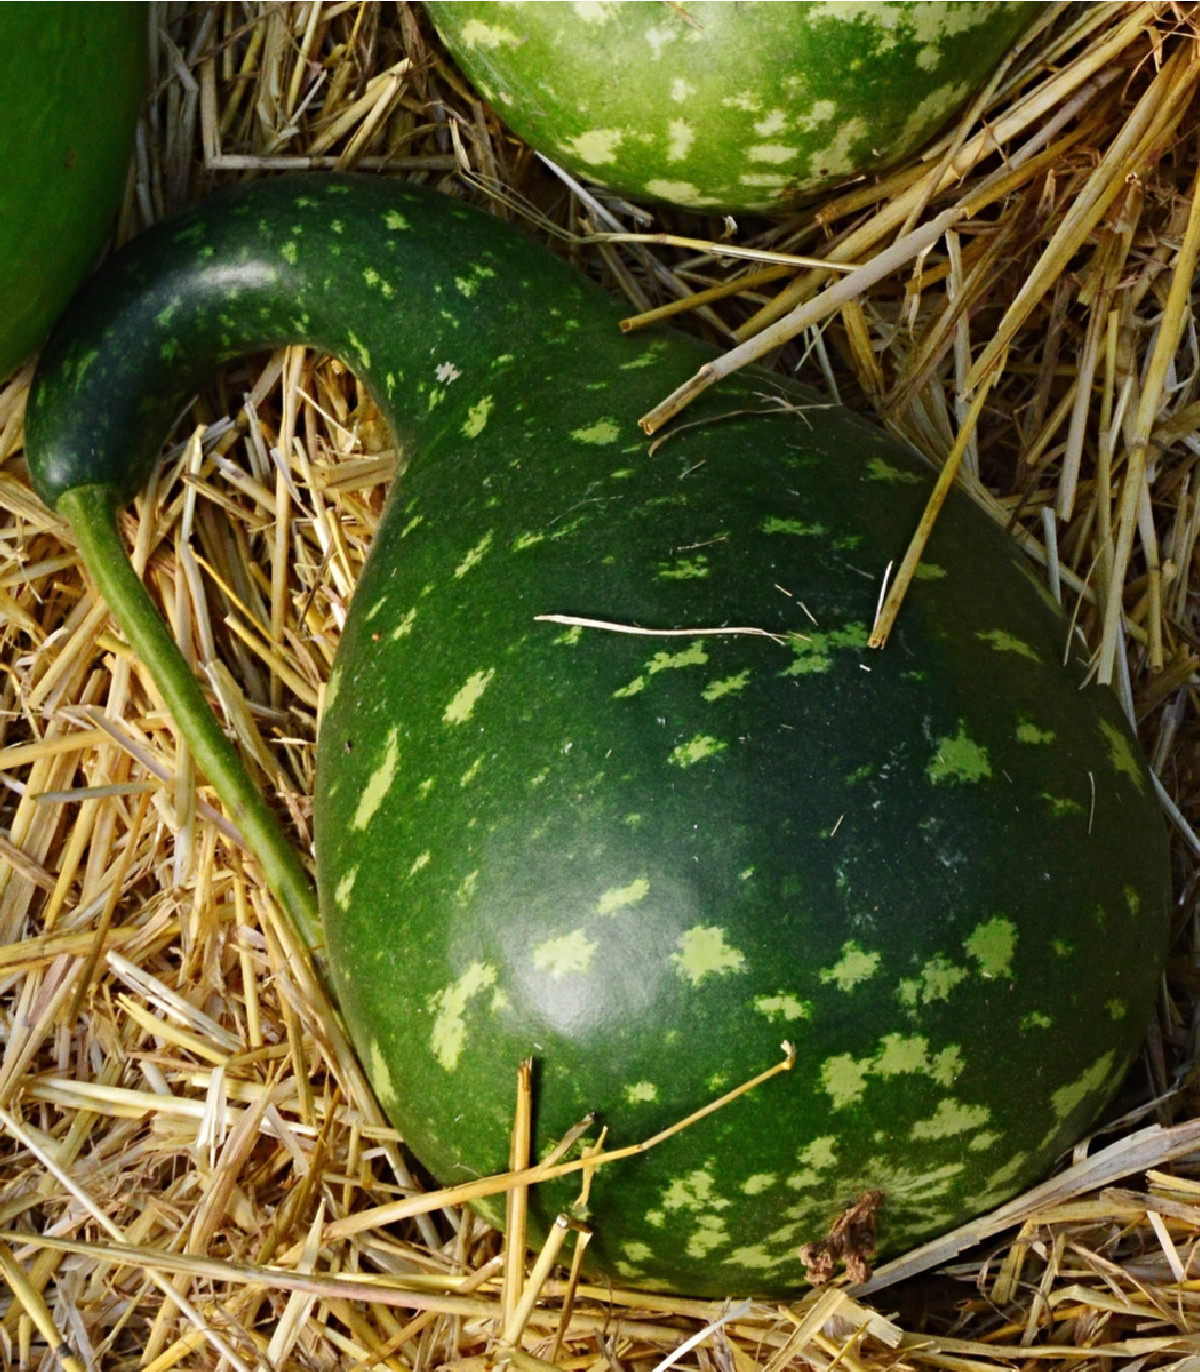 Okrasná tekvica Cobra - Lagenaria siceraria - semená tekvice - semiačka - 5 ks